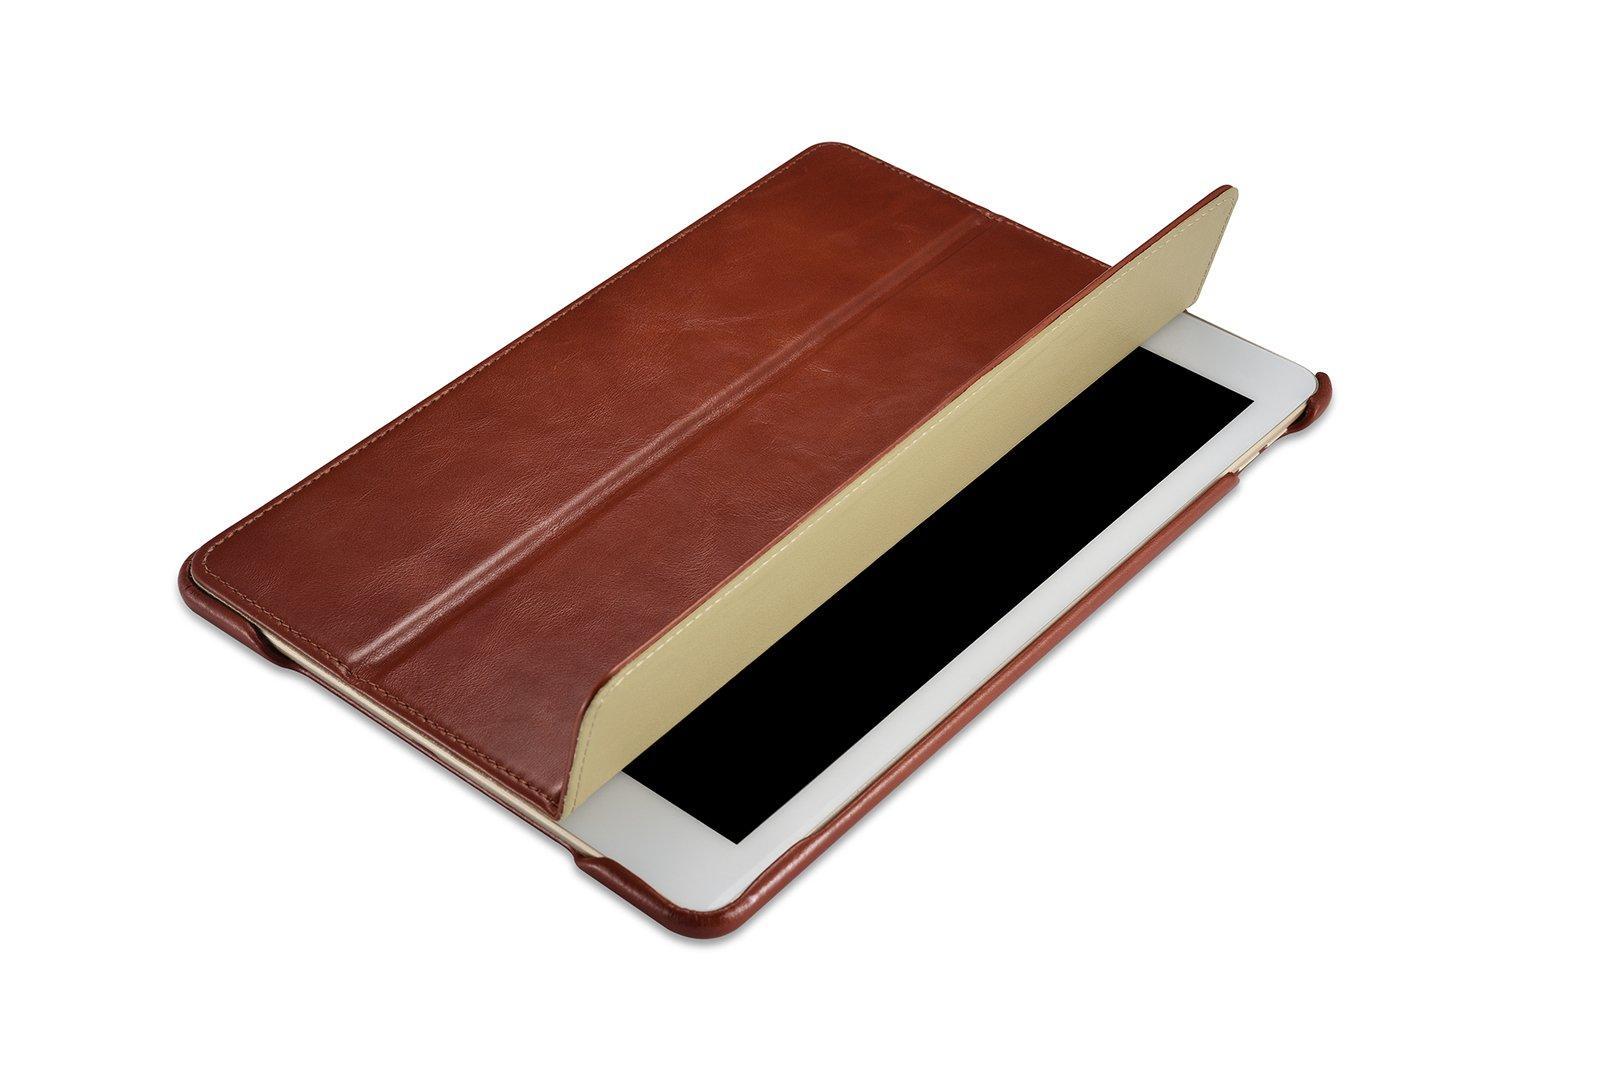 Burkley Premium Leather Smart Folio Case for Apple iPad Pro 10.5'' | Handmade Leather with waterproof interior | Brown